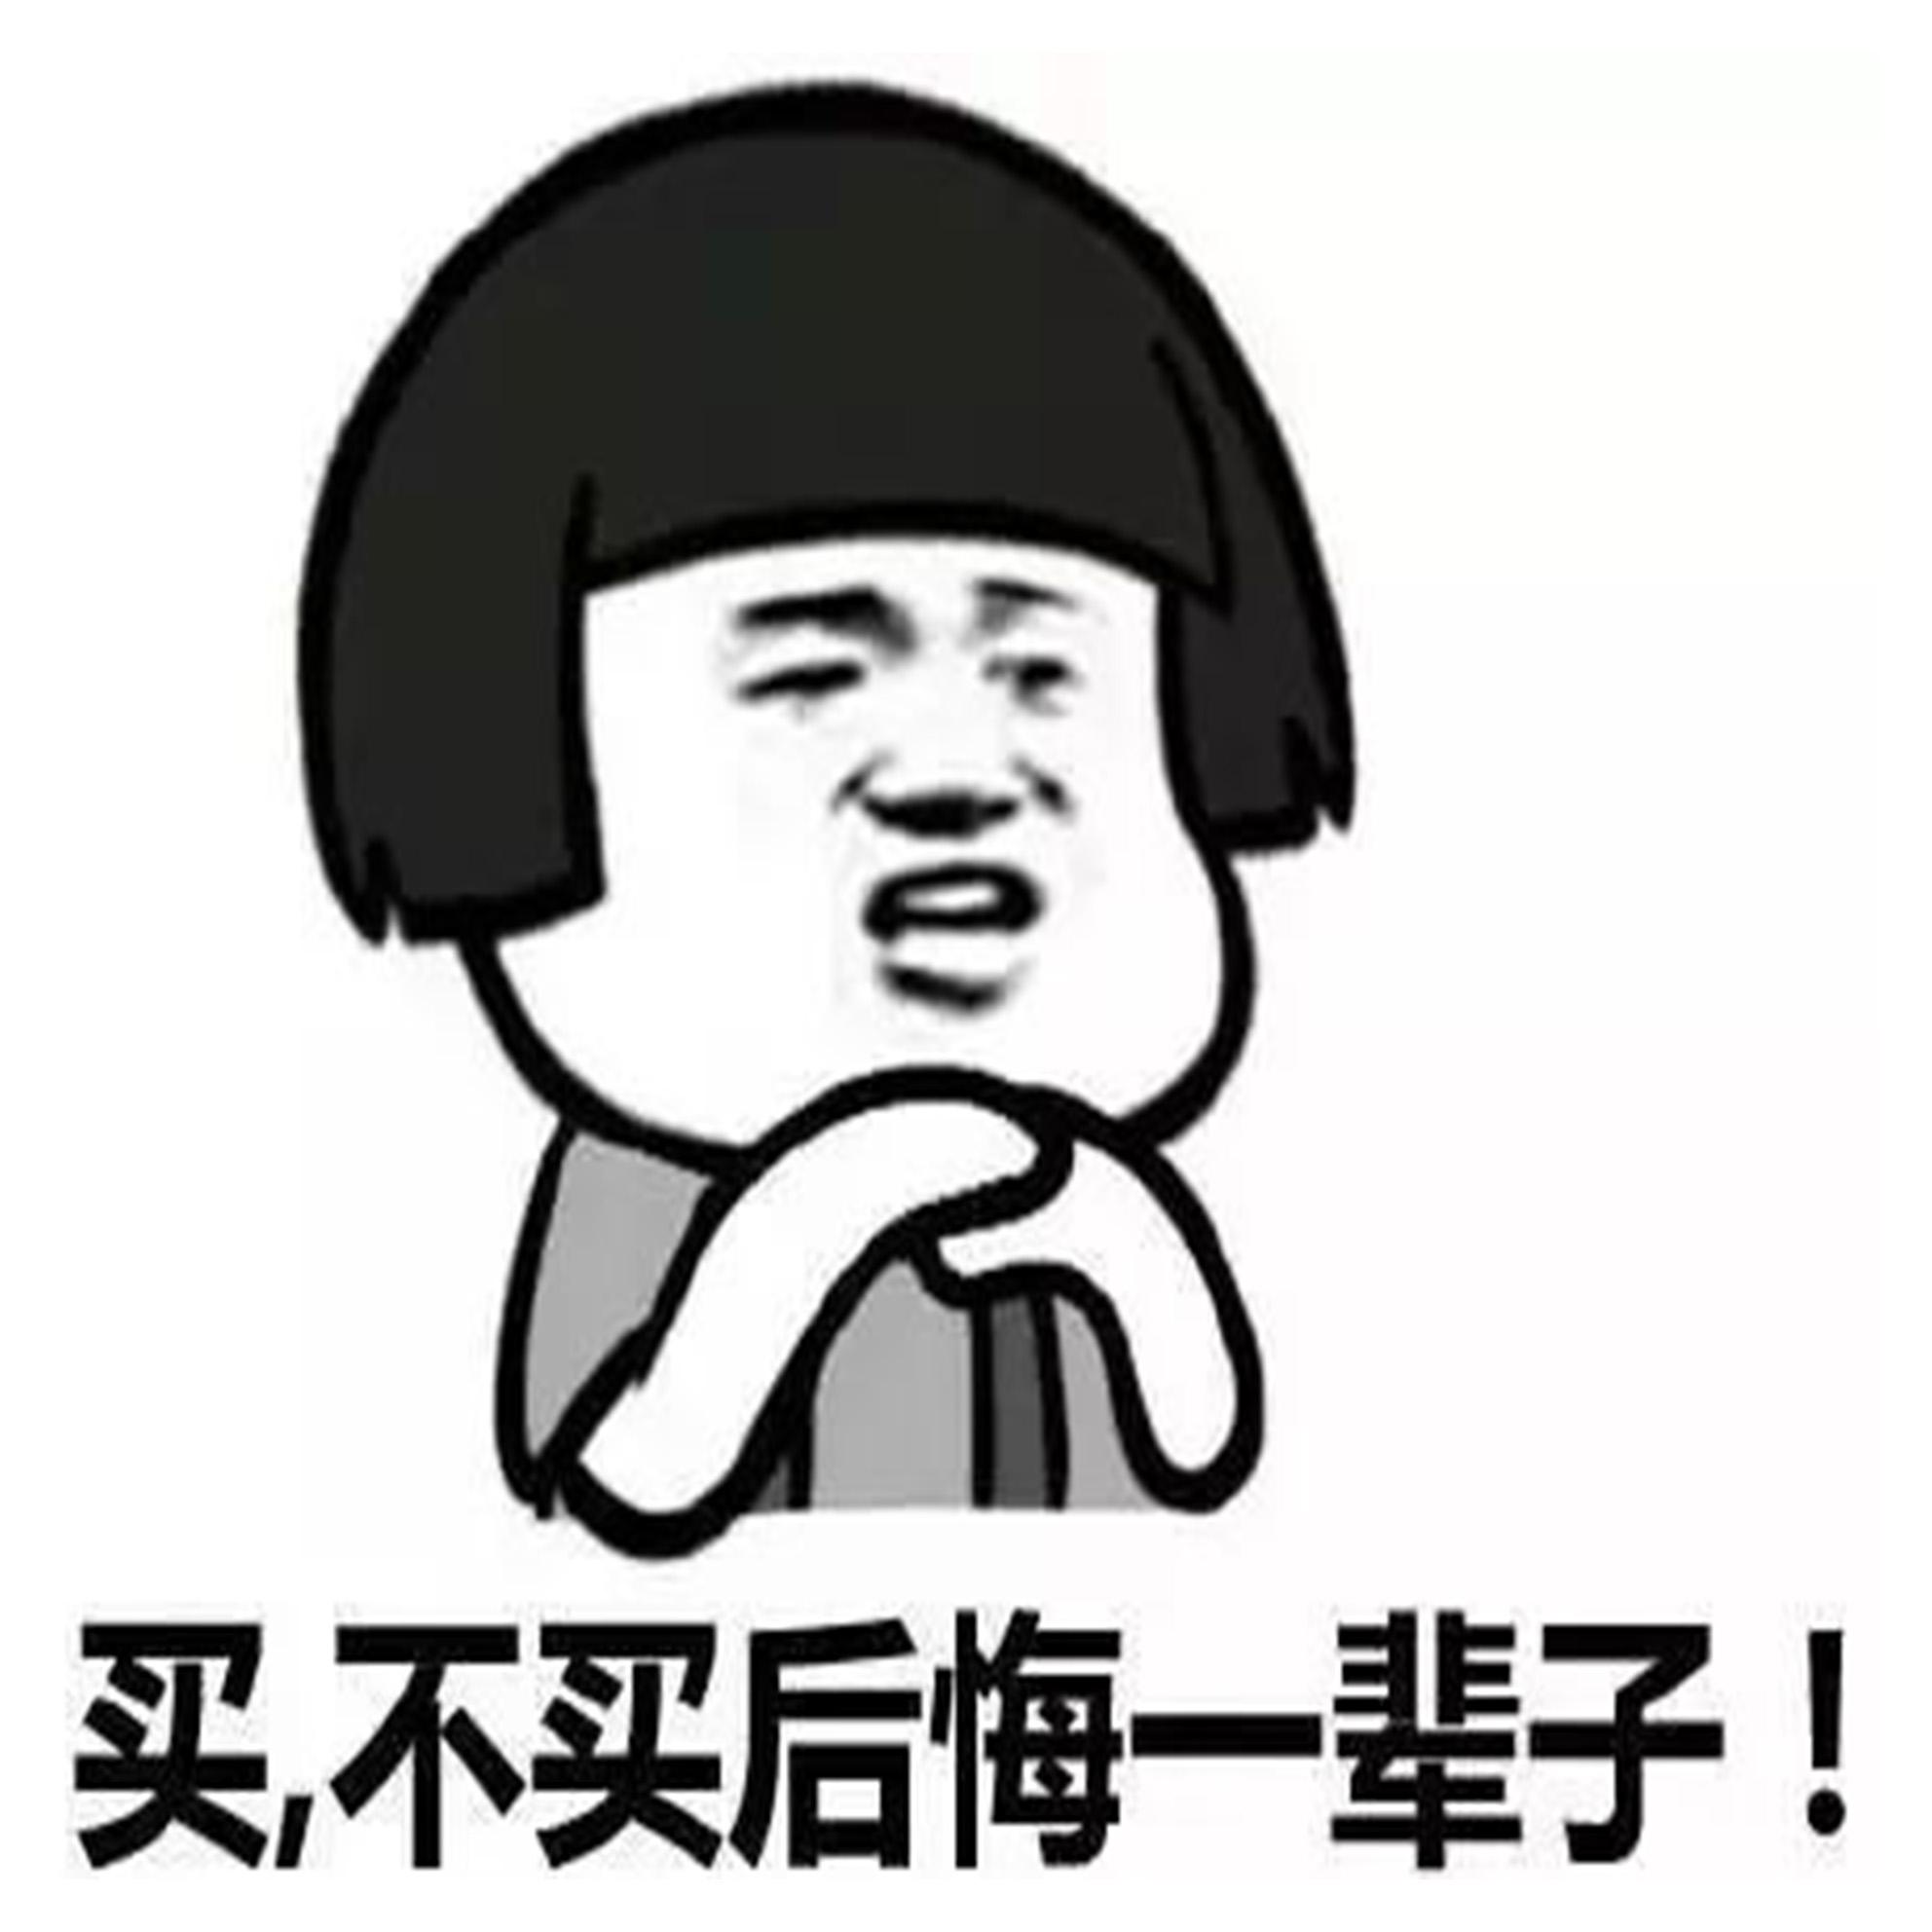 colourpop卡了泡泡眼影土豆泥眼影dgaf/moonwalk/frog/amaze